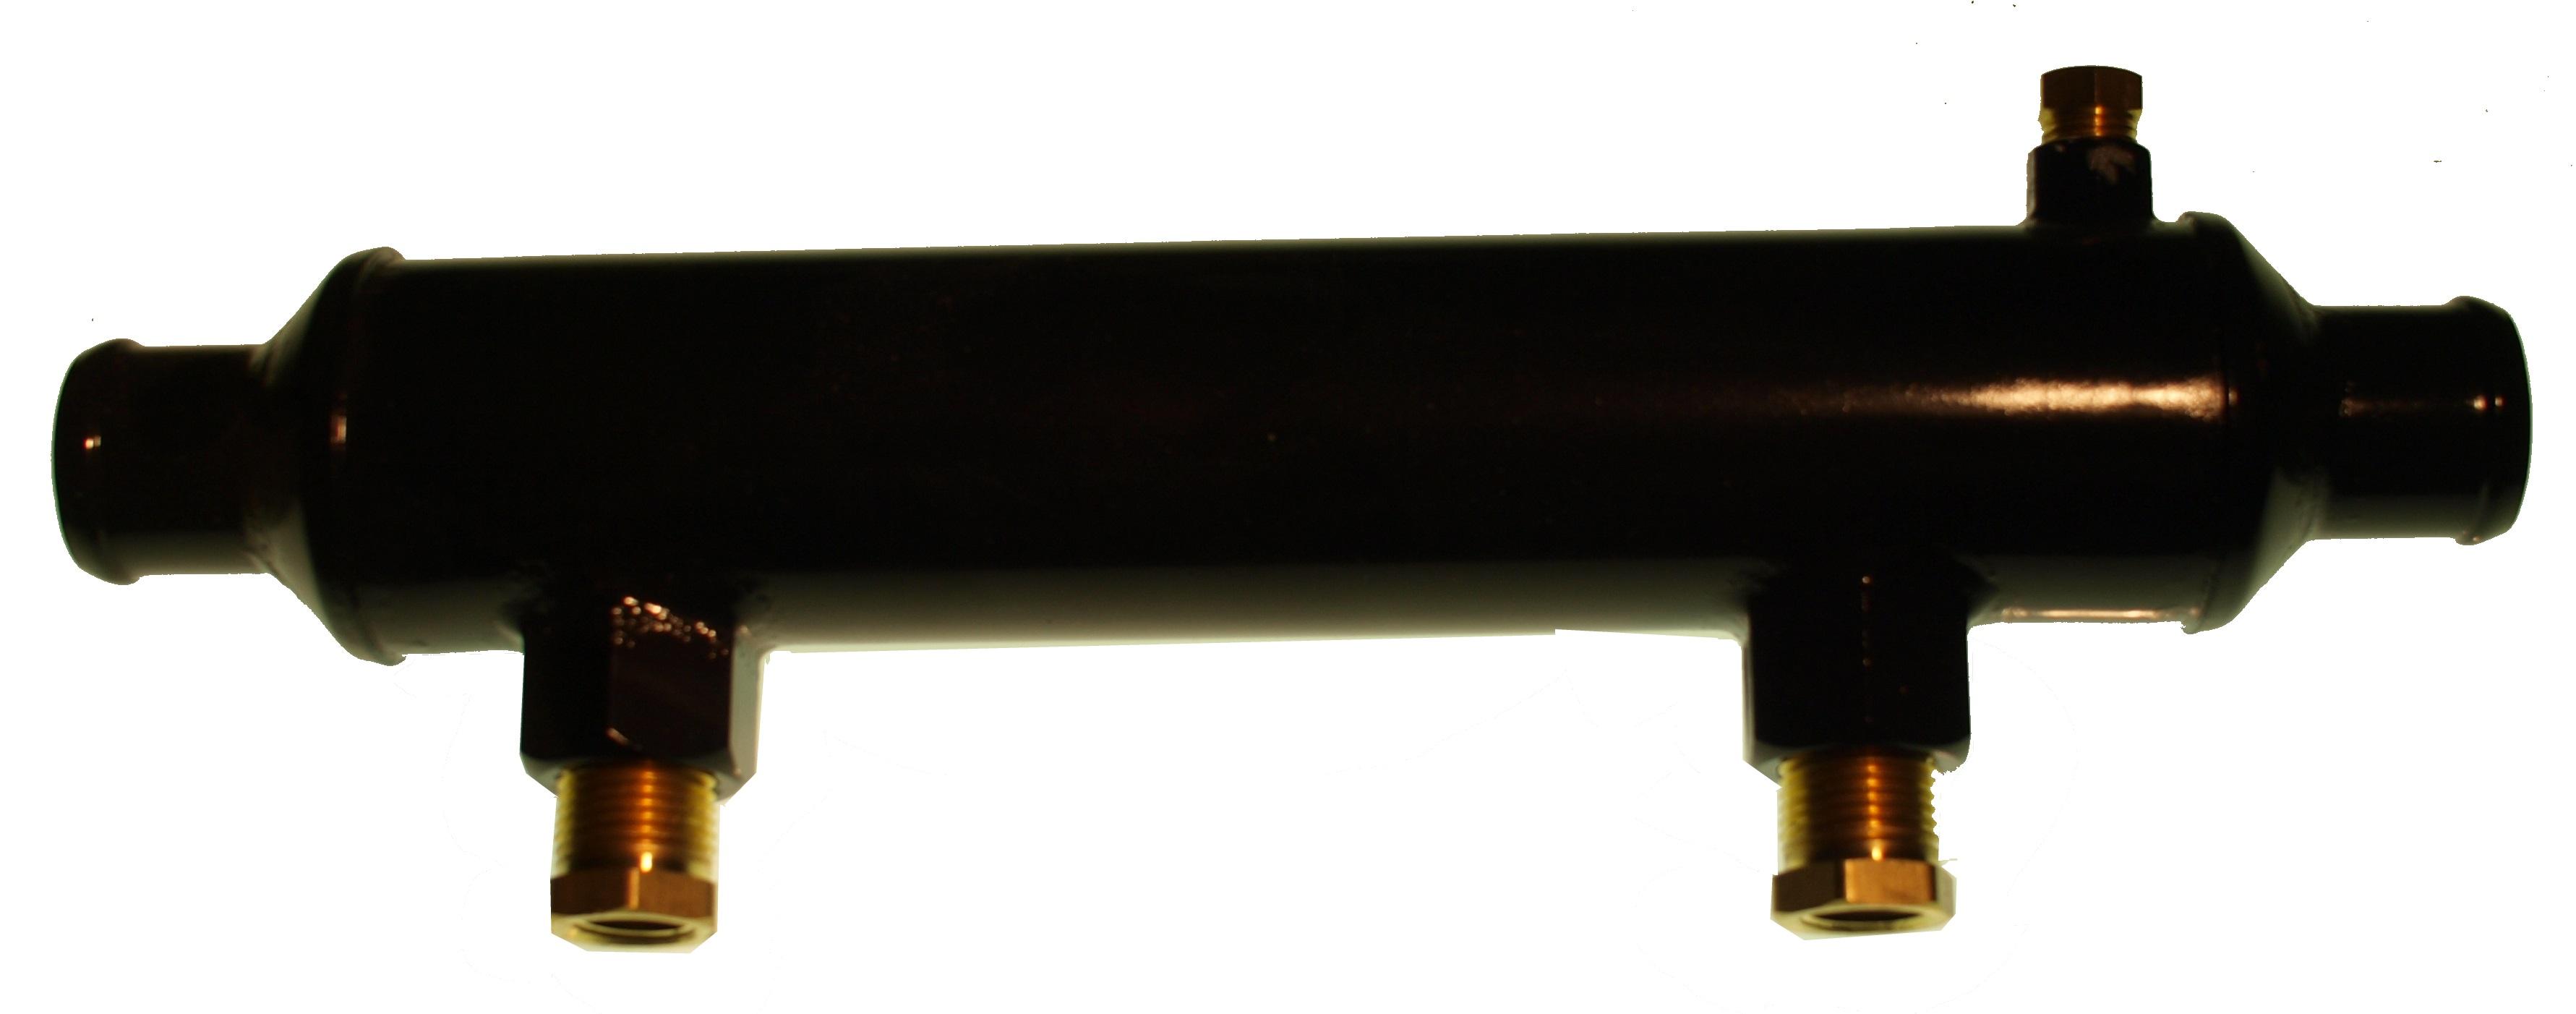 Oljekylare 10 tum - 32 mm anslutning